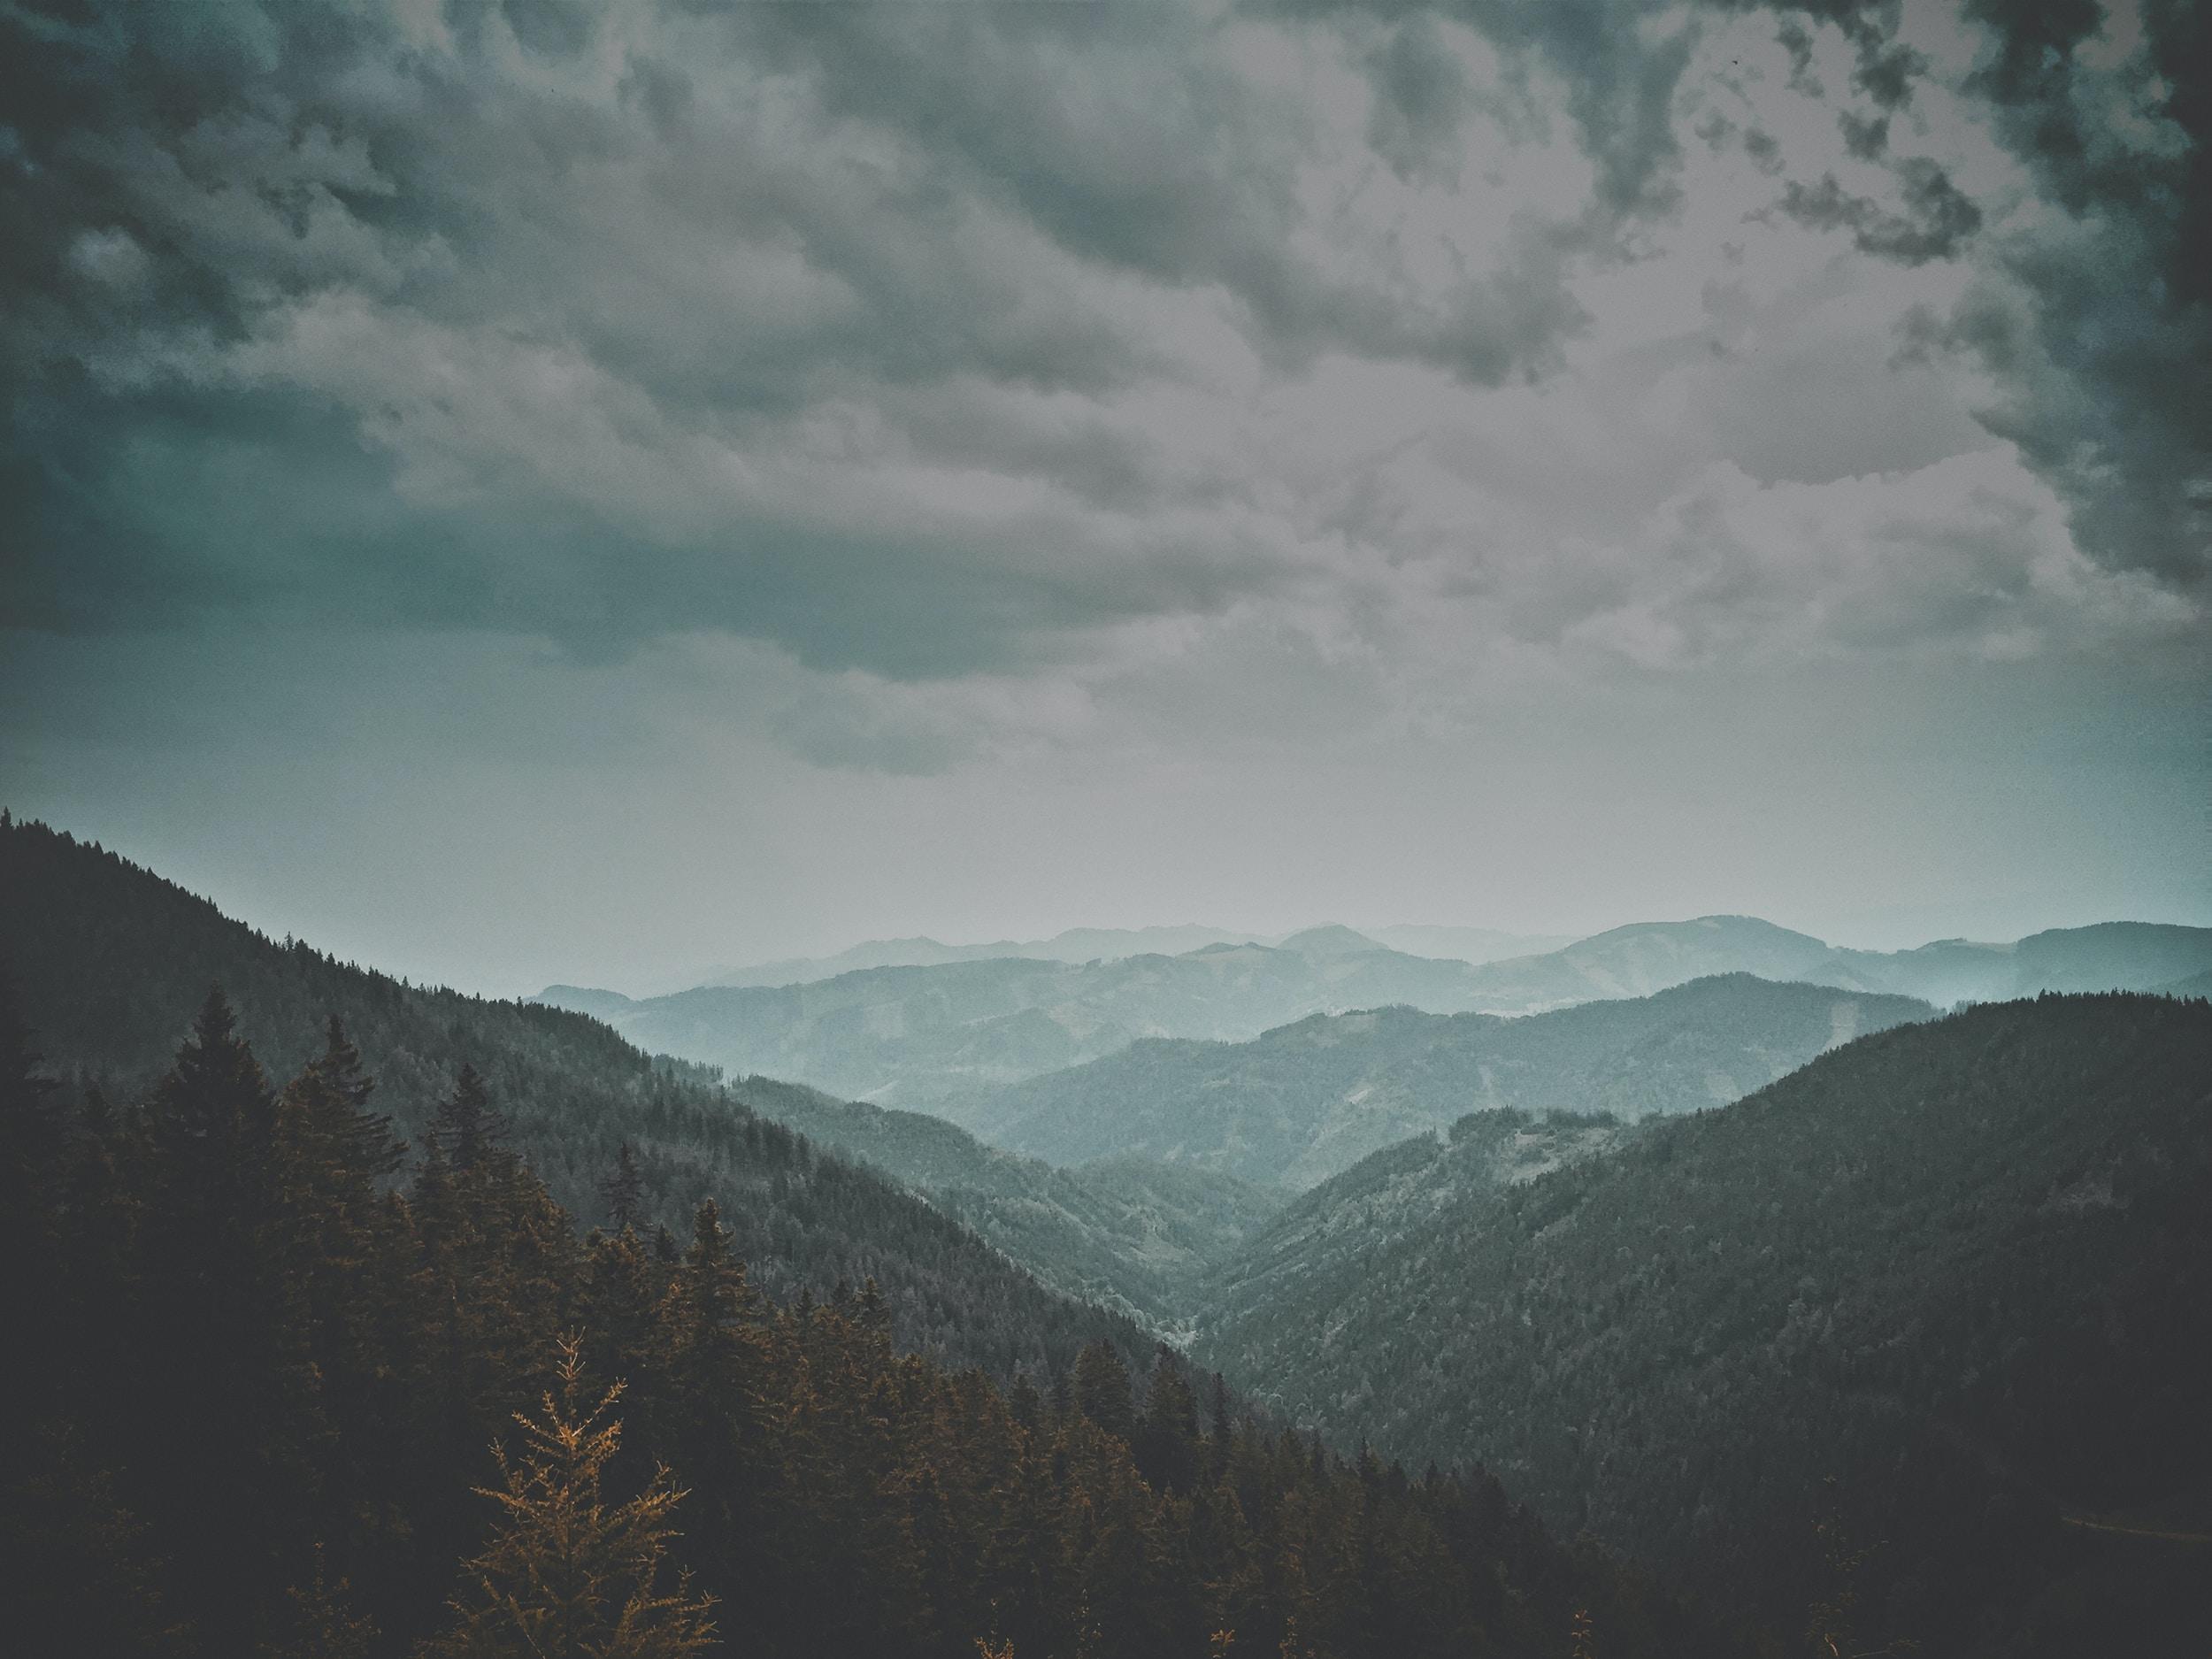 A mountainous landscape in fog under heavy clouds